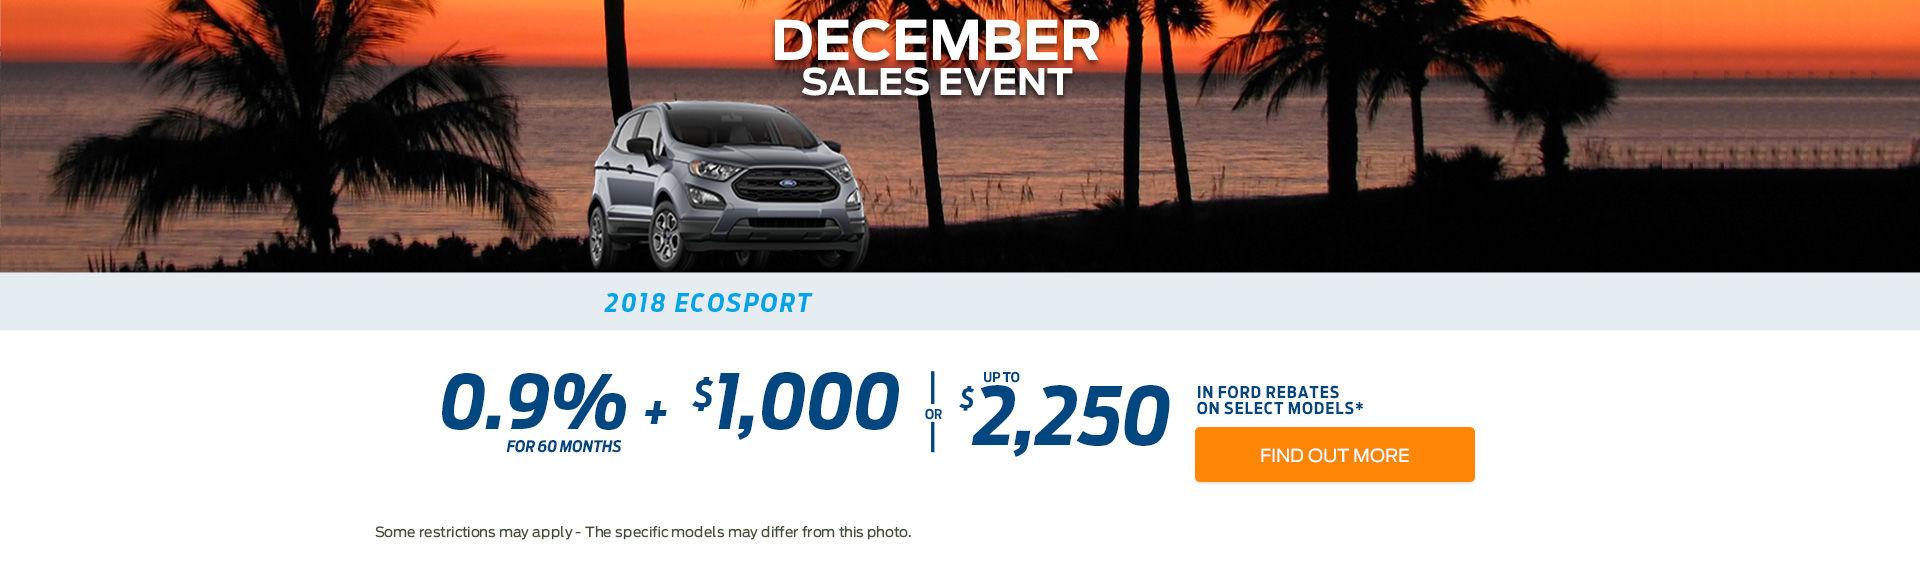 December sales event - ecosport